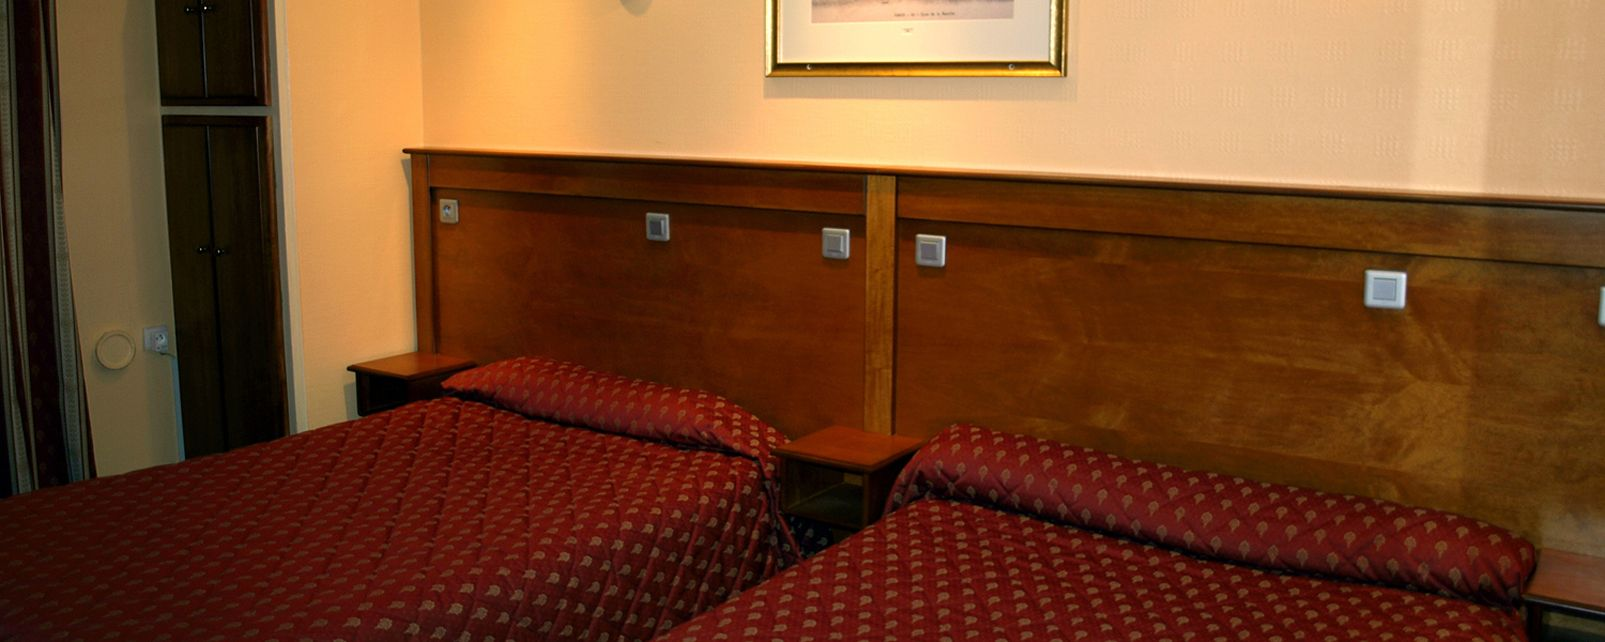 Hotel Grand Hotel Amelot